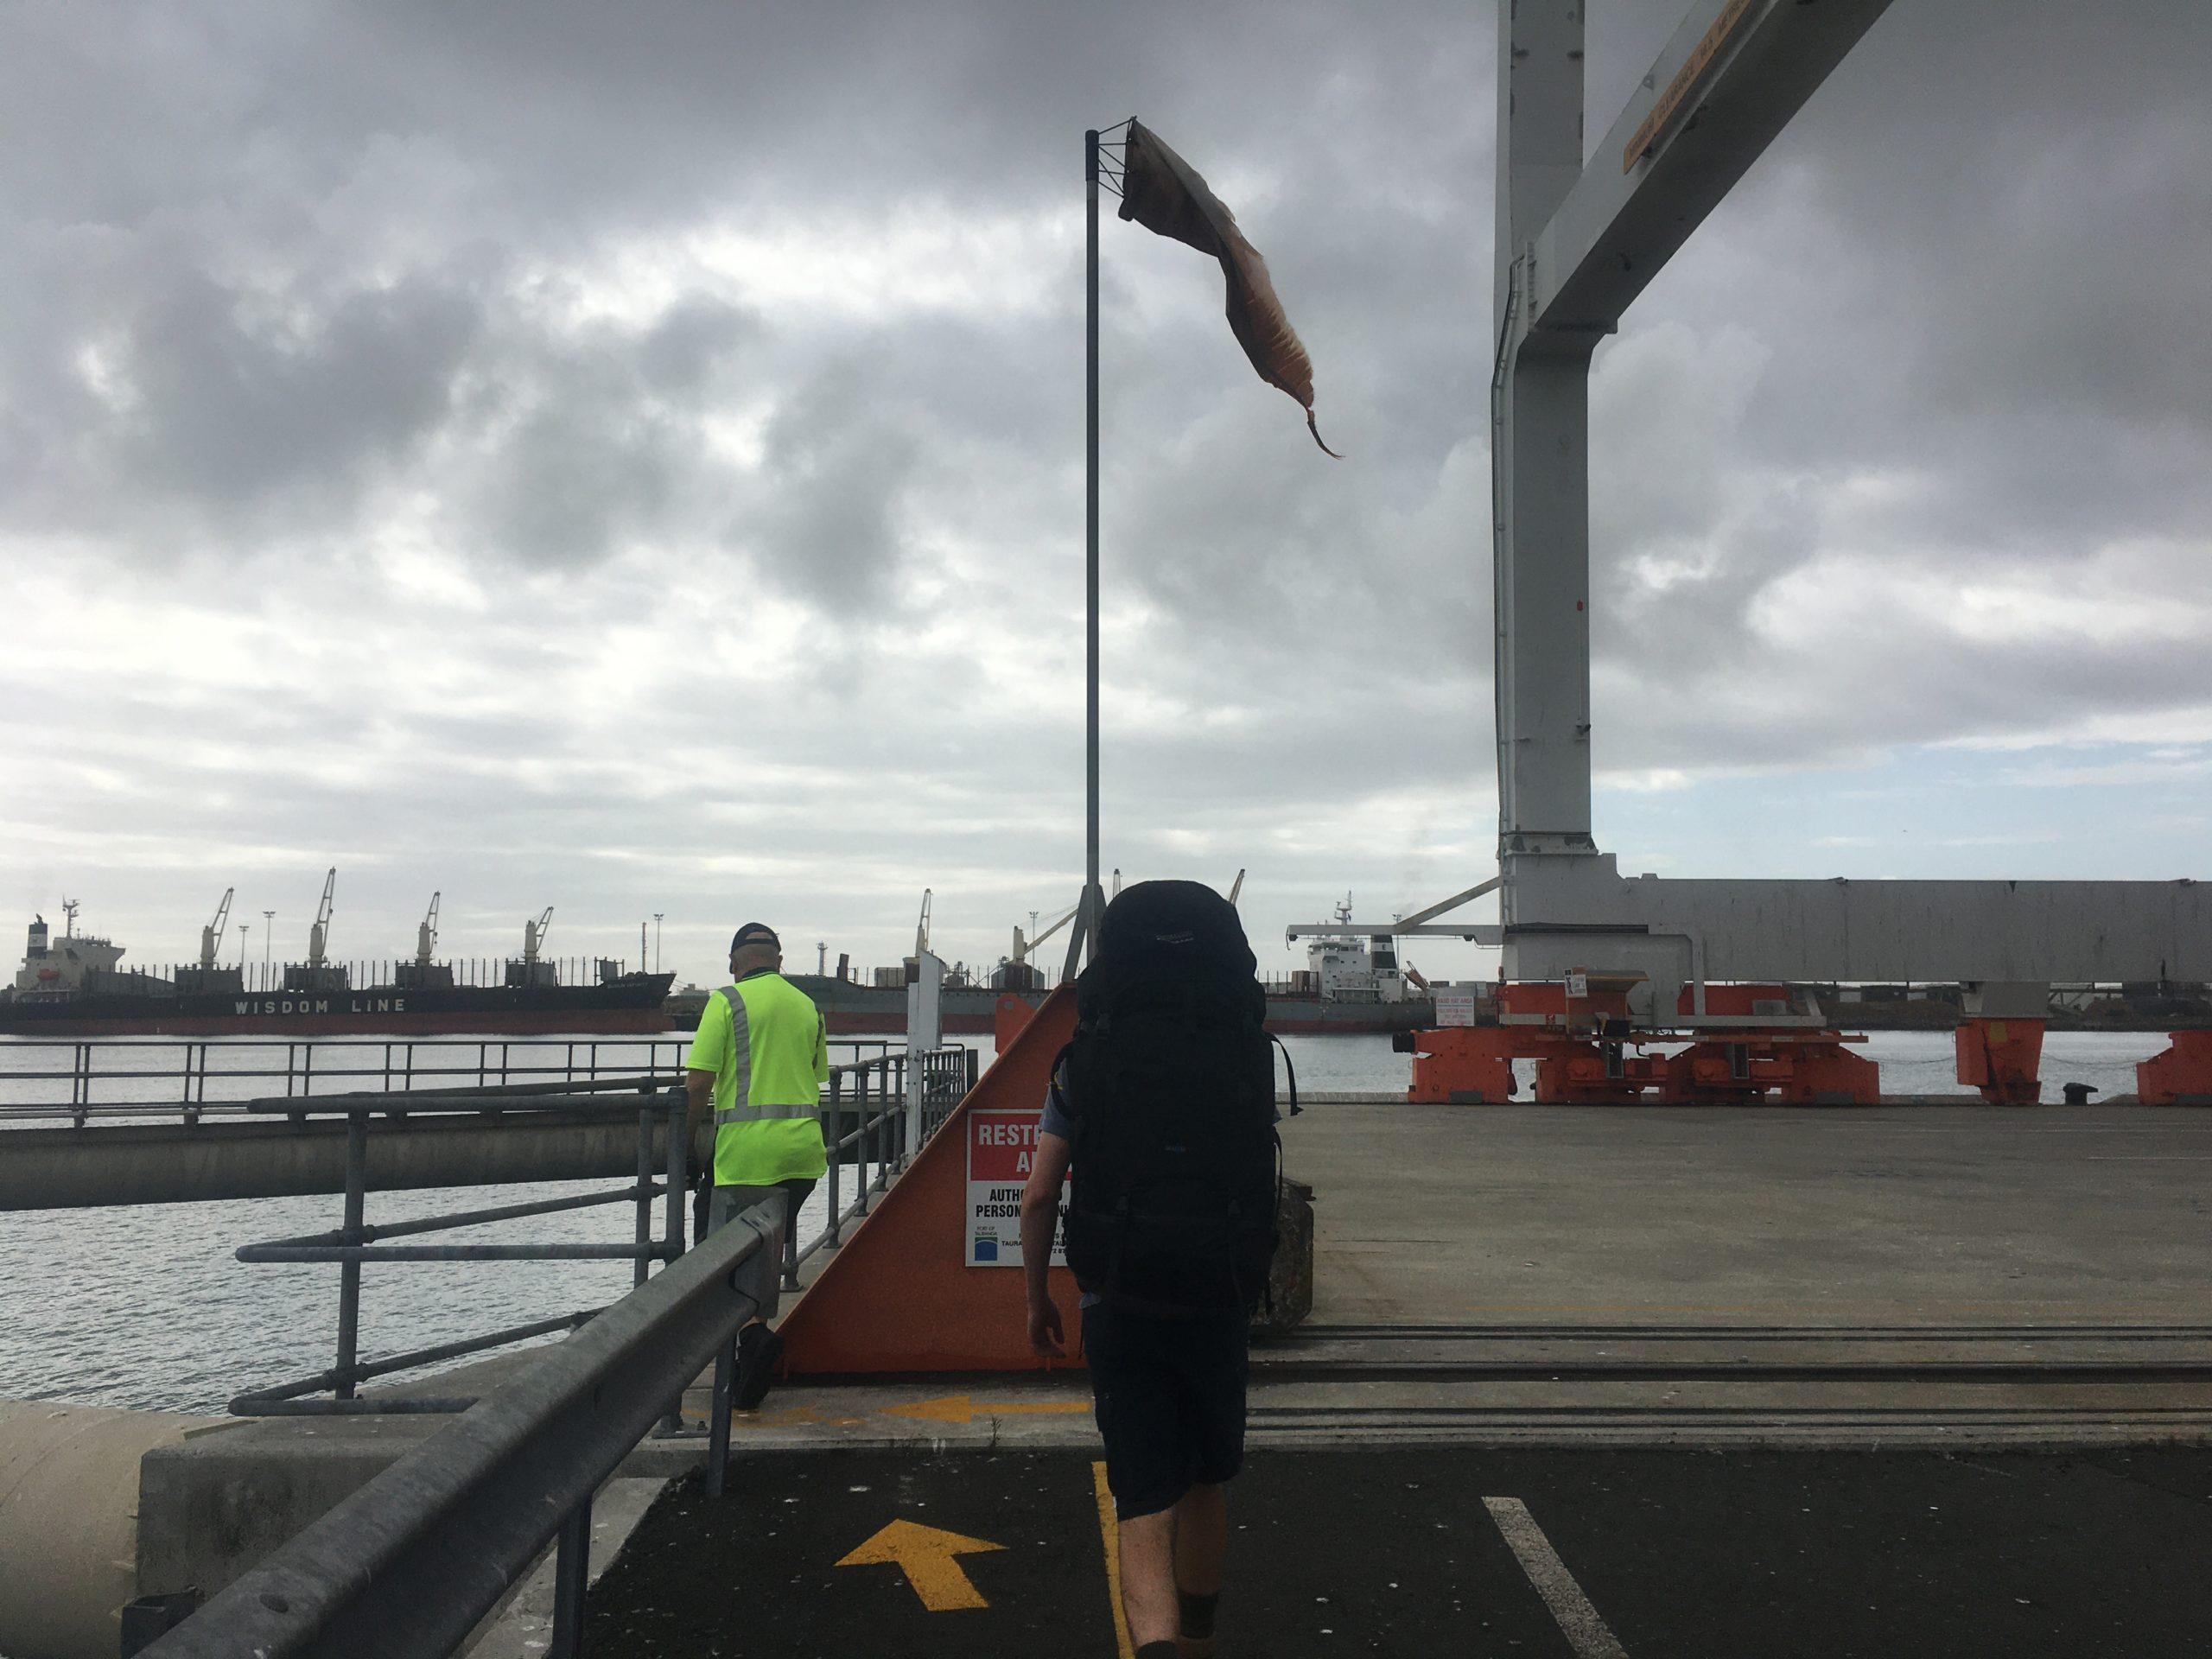 Following security down to the wharf at Tauranga